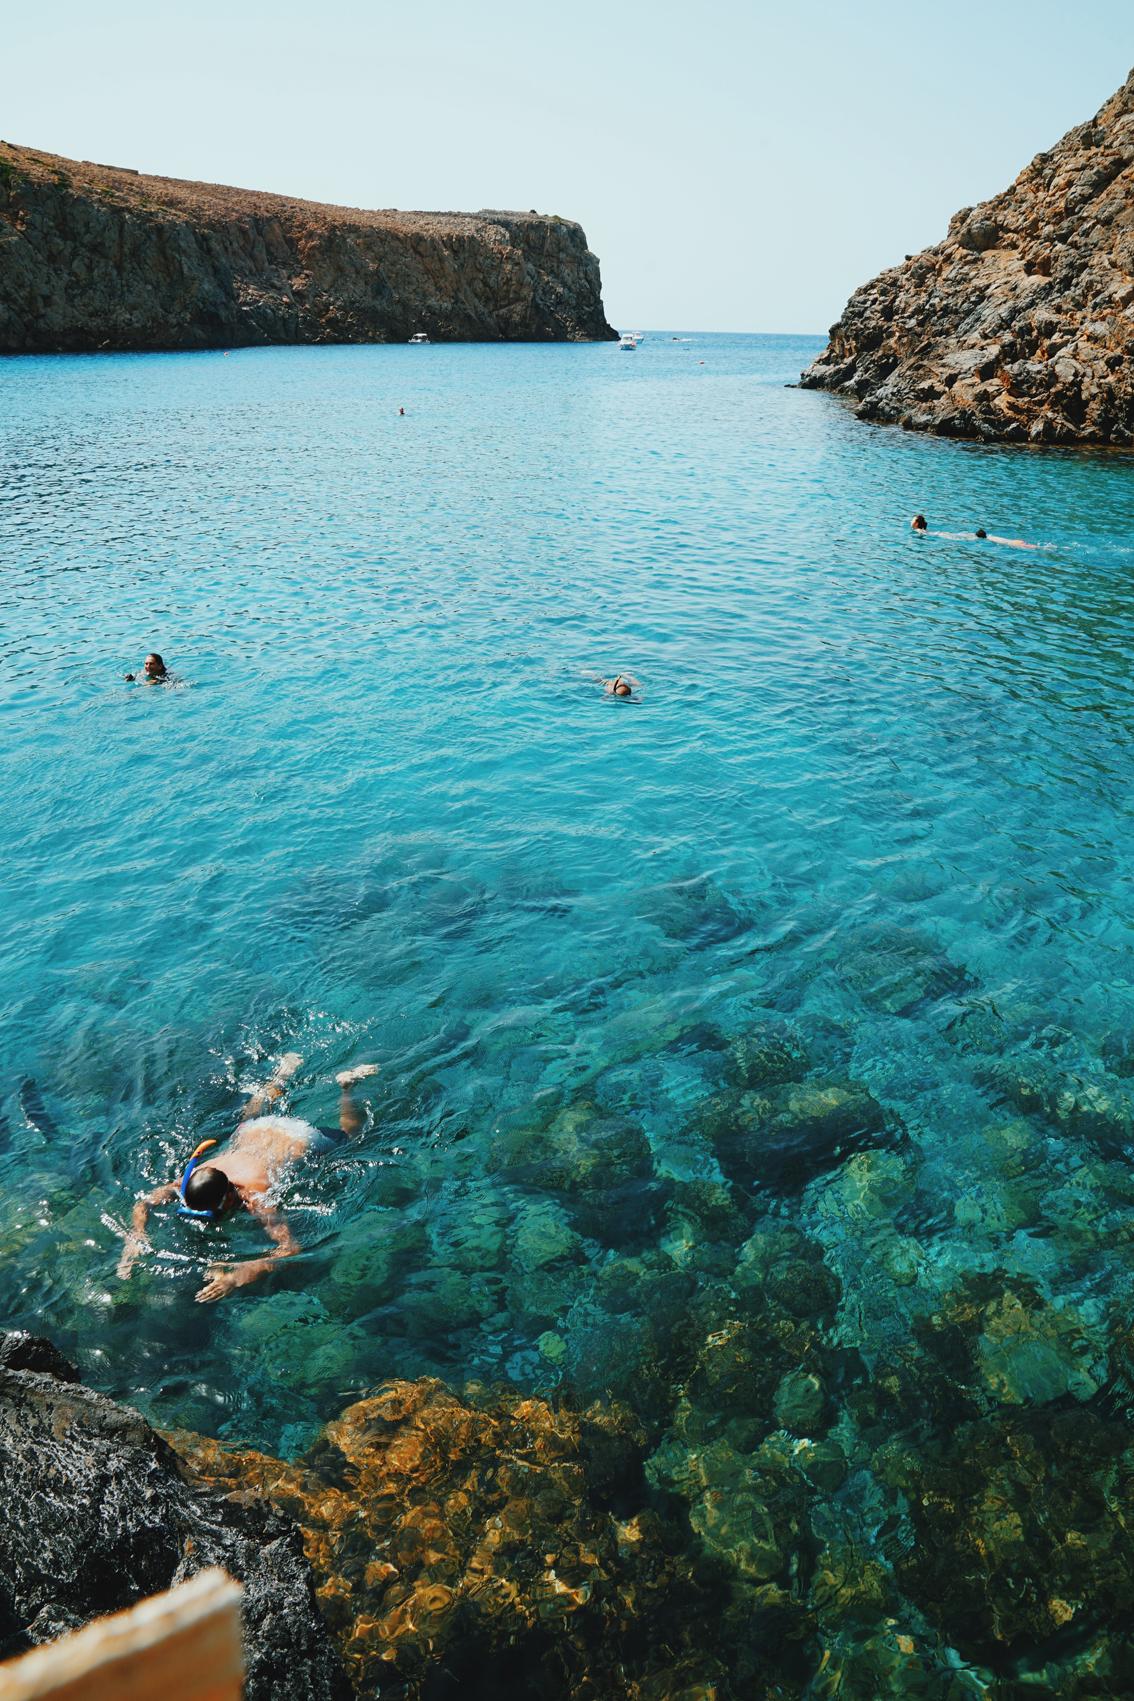 26 2 days in Cagliari ( Sardinia ), where to sleep to discover the best beaches.